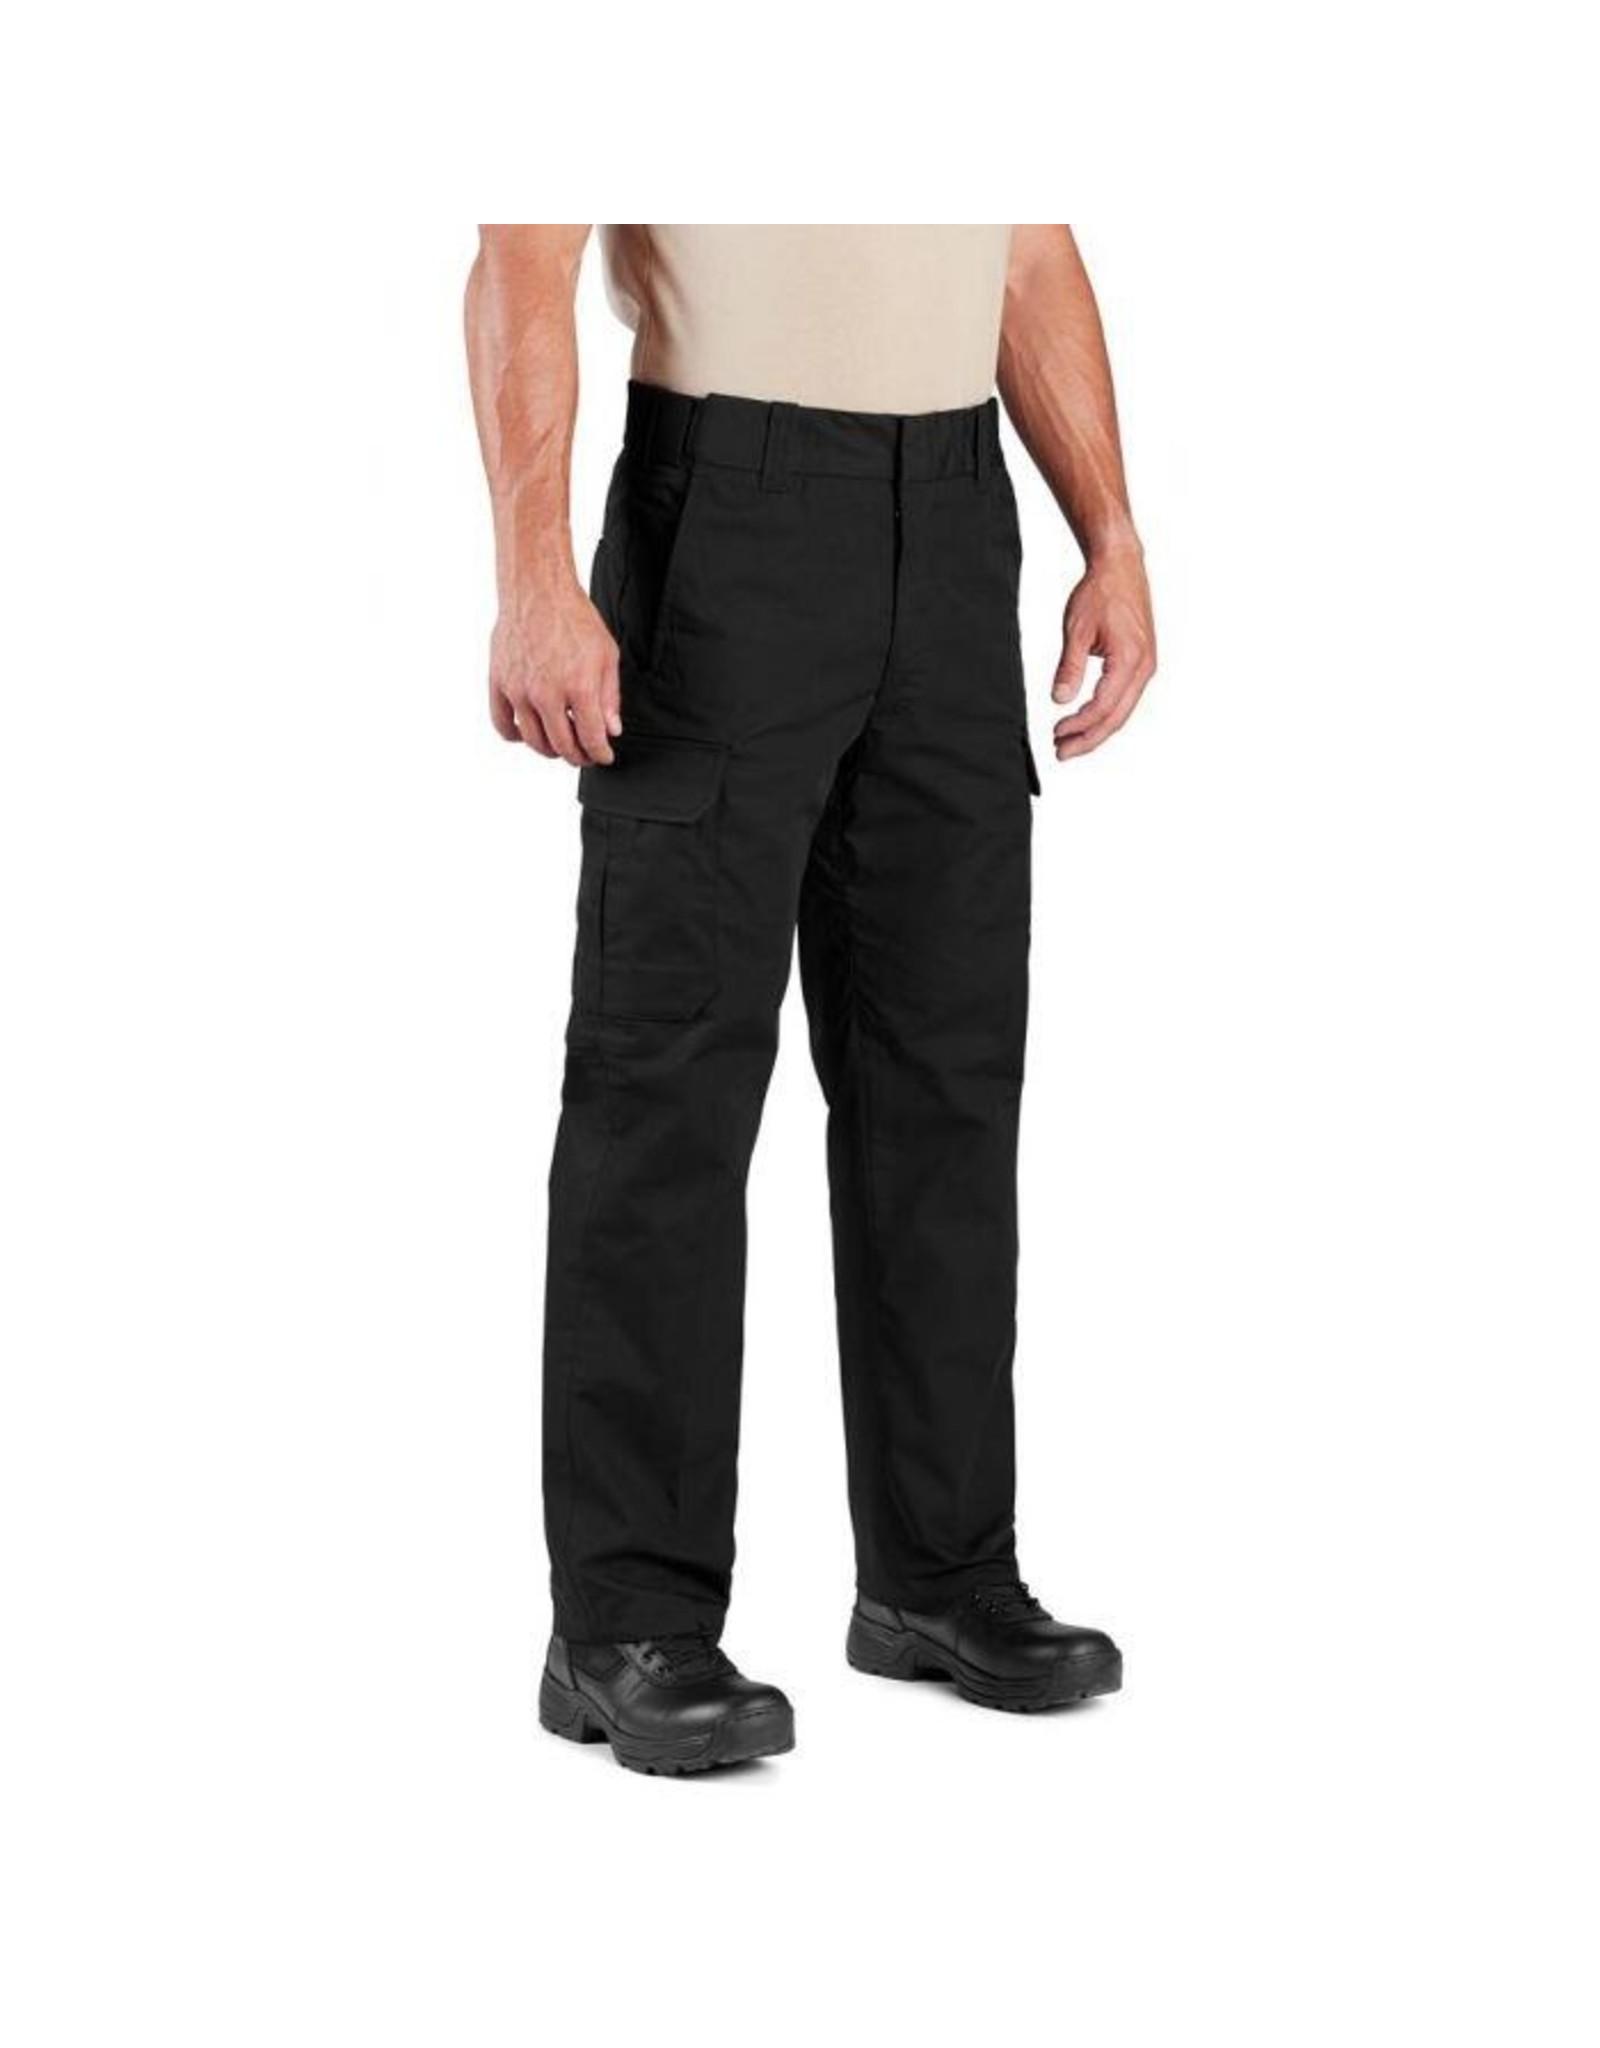 Propper Propper Mens Duty Cargo Pants Black (42X32)